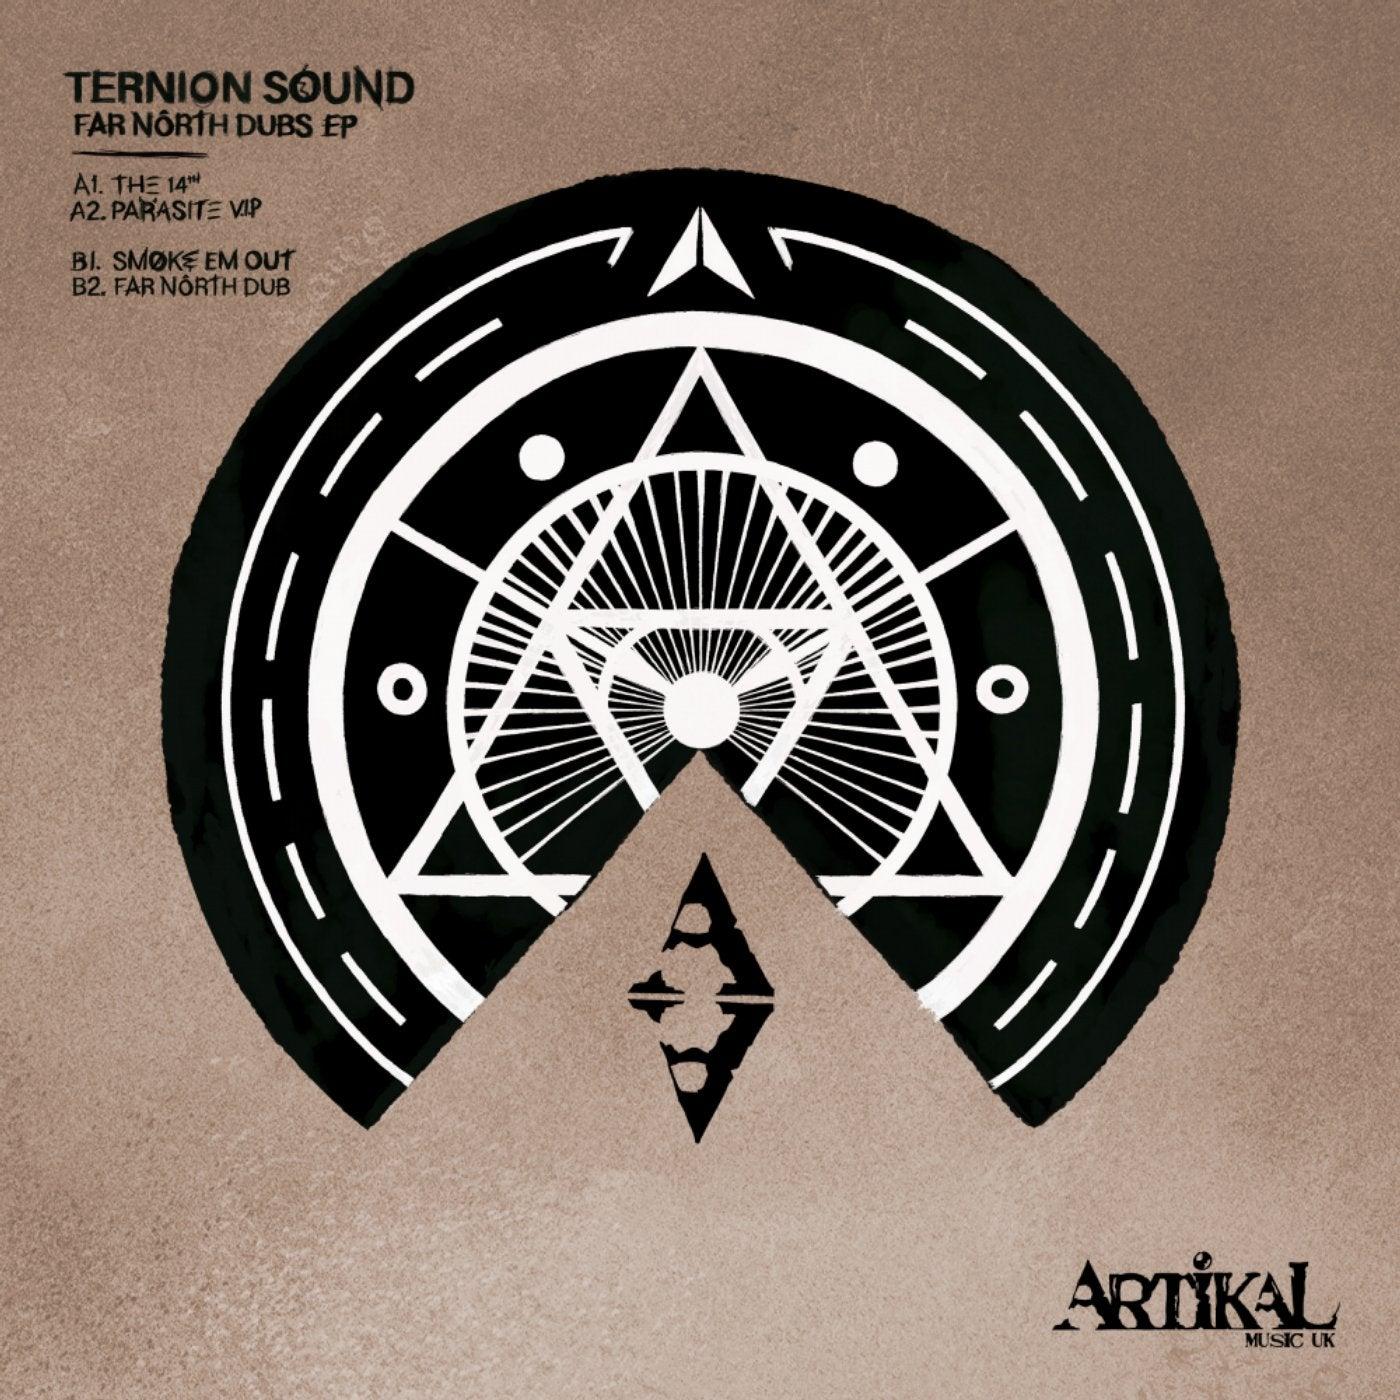 The 14th (Original Mix)